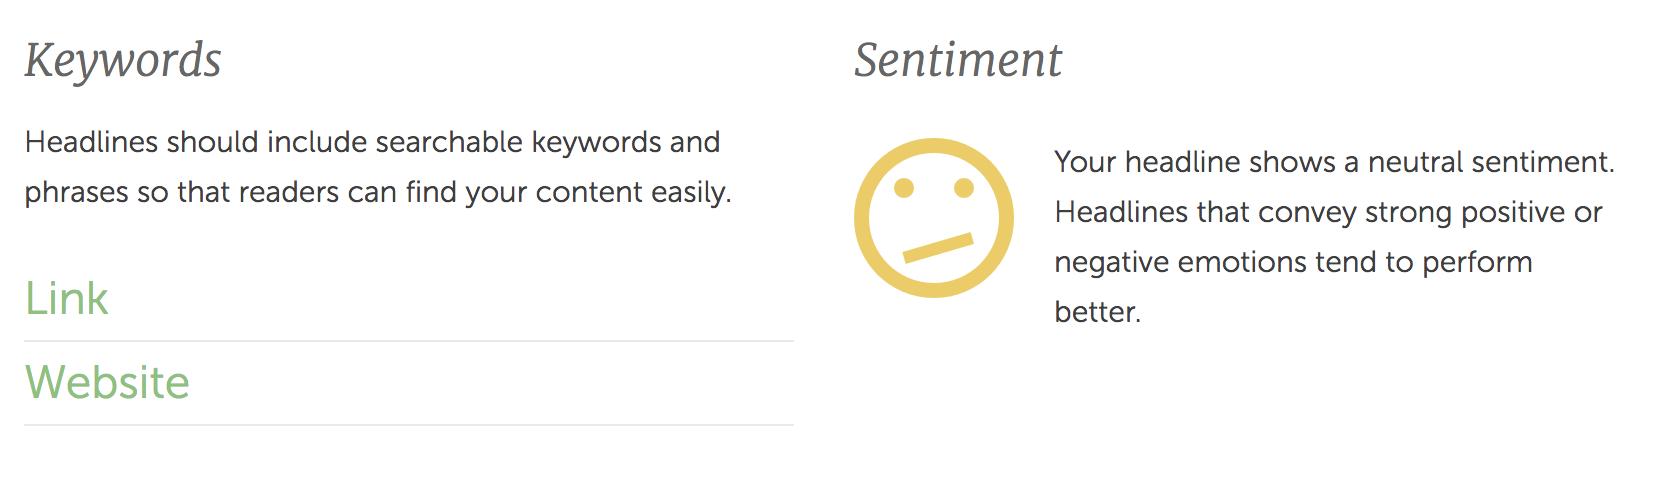 headline keywords and sentiment